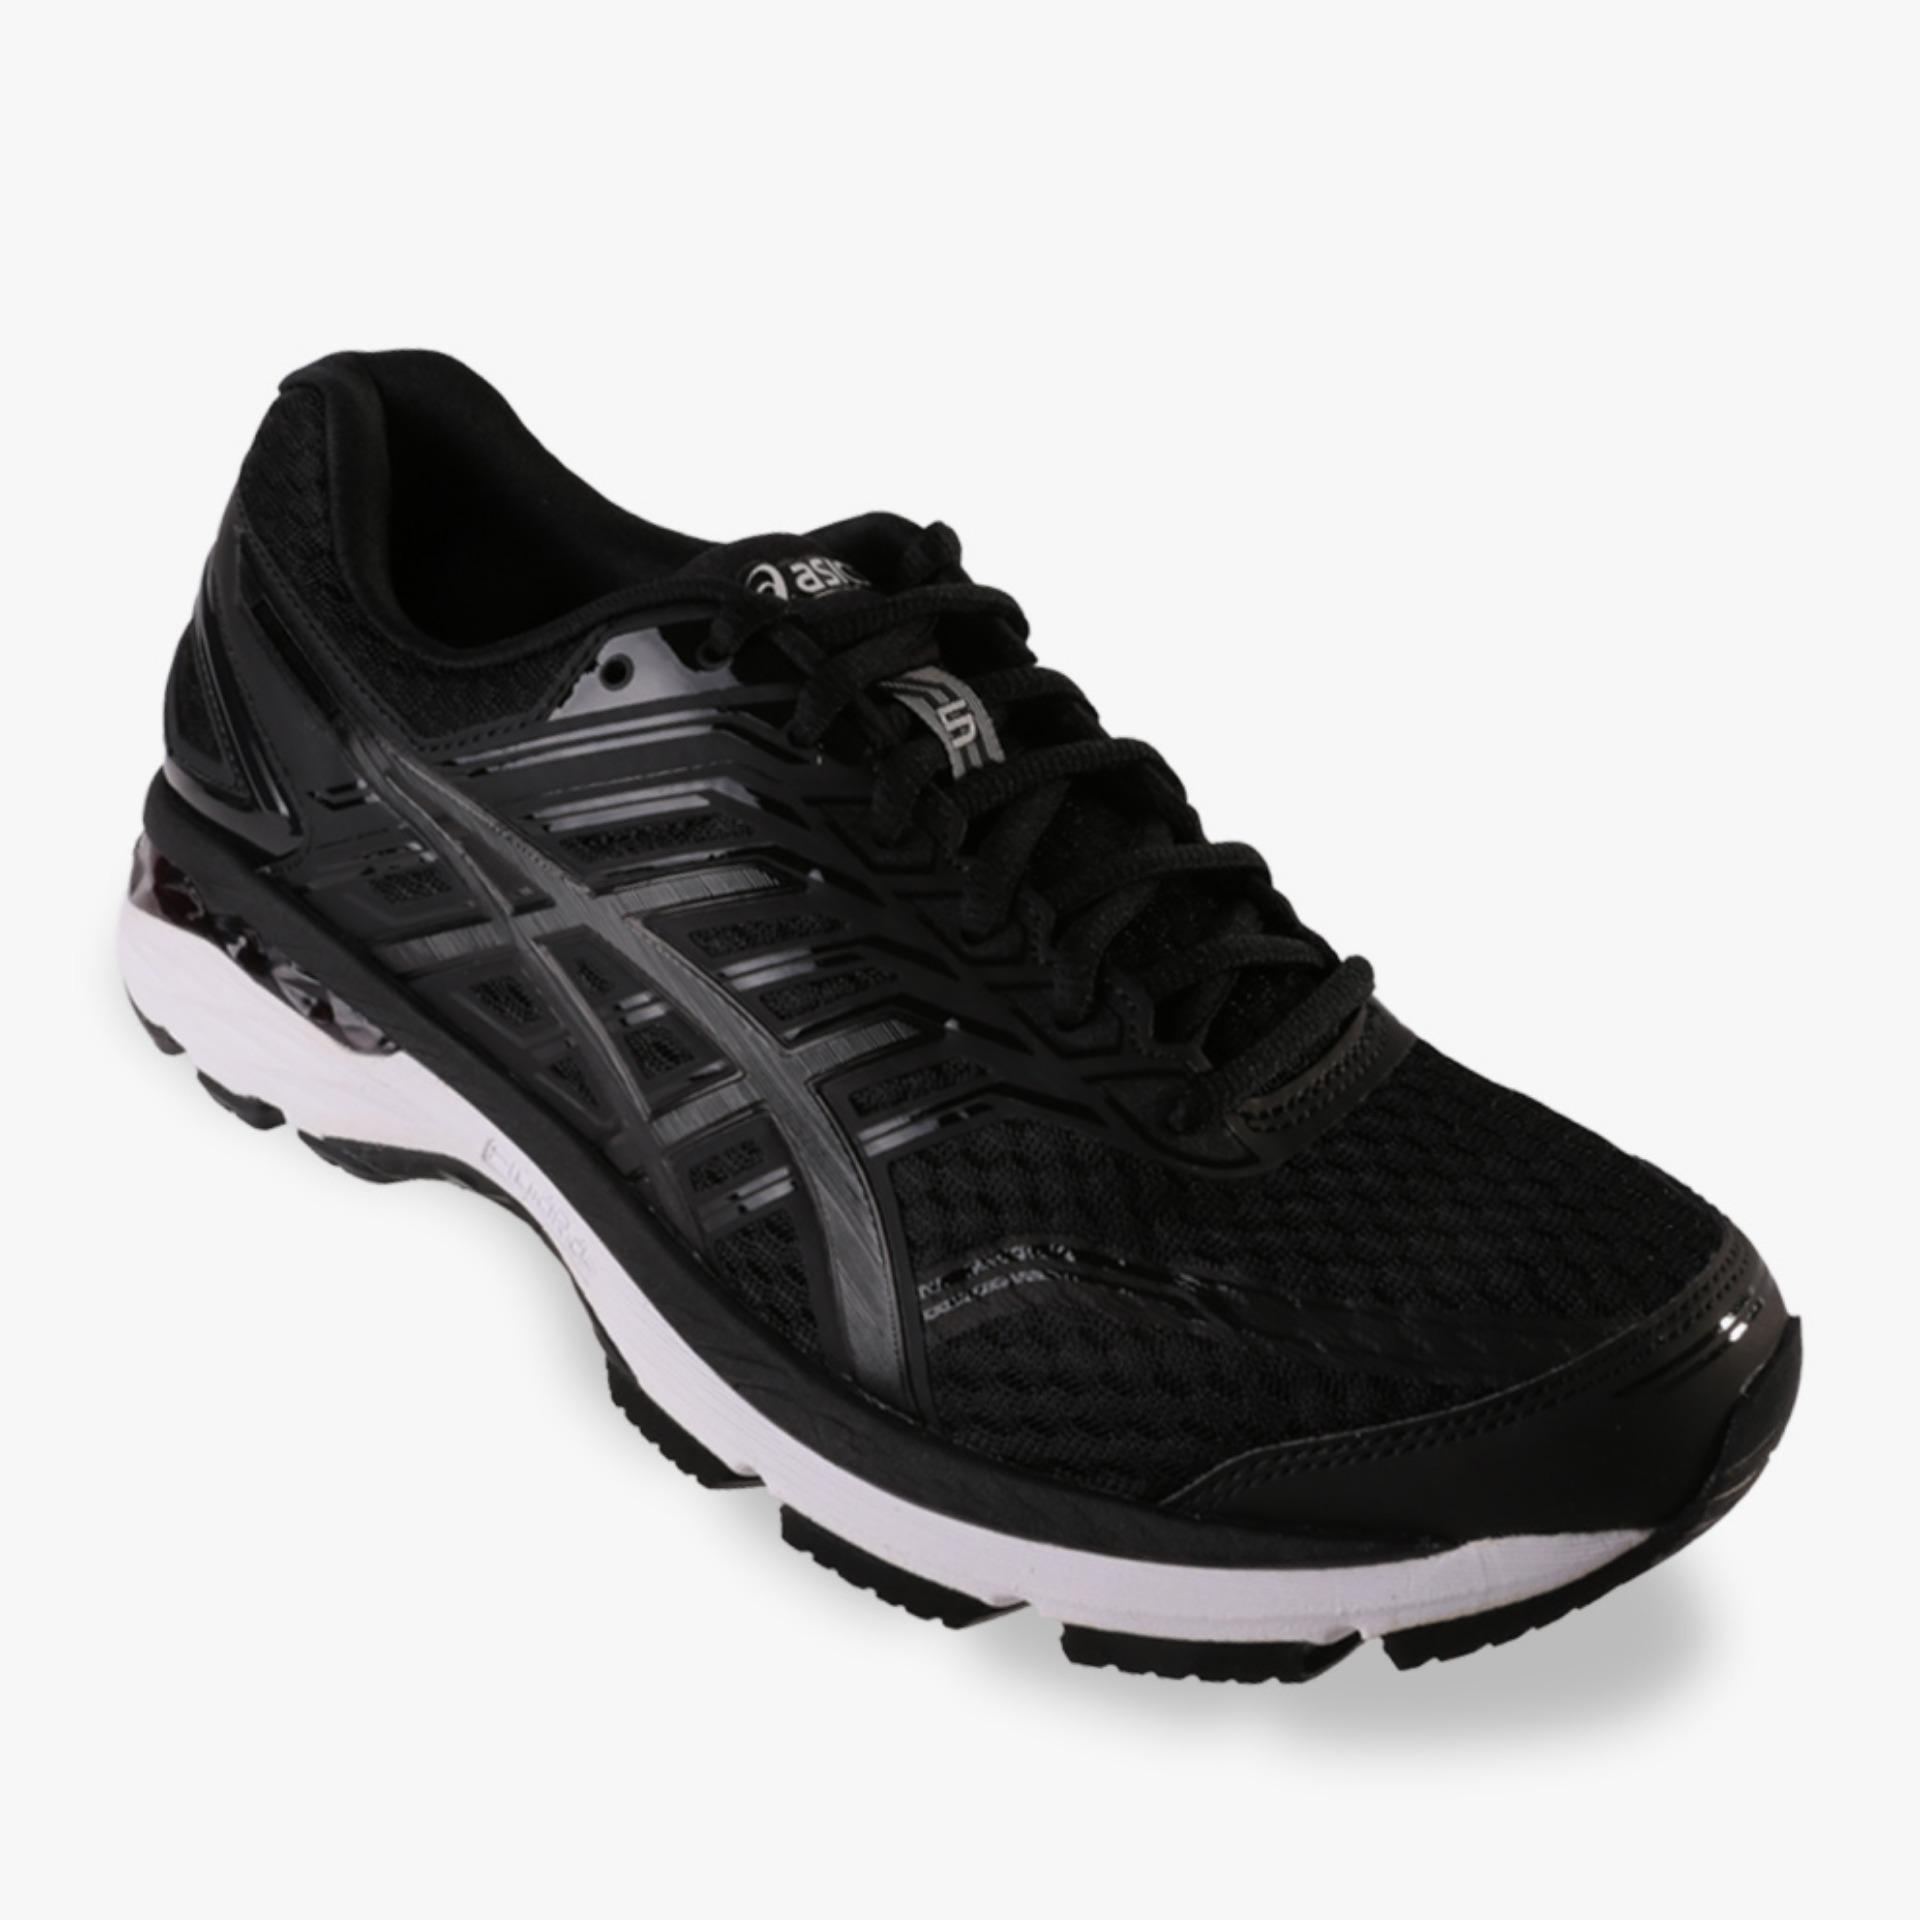 Harga Asics Gt 2000 5 Men S Running Shoes Hitam Online